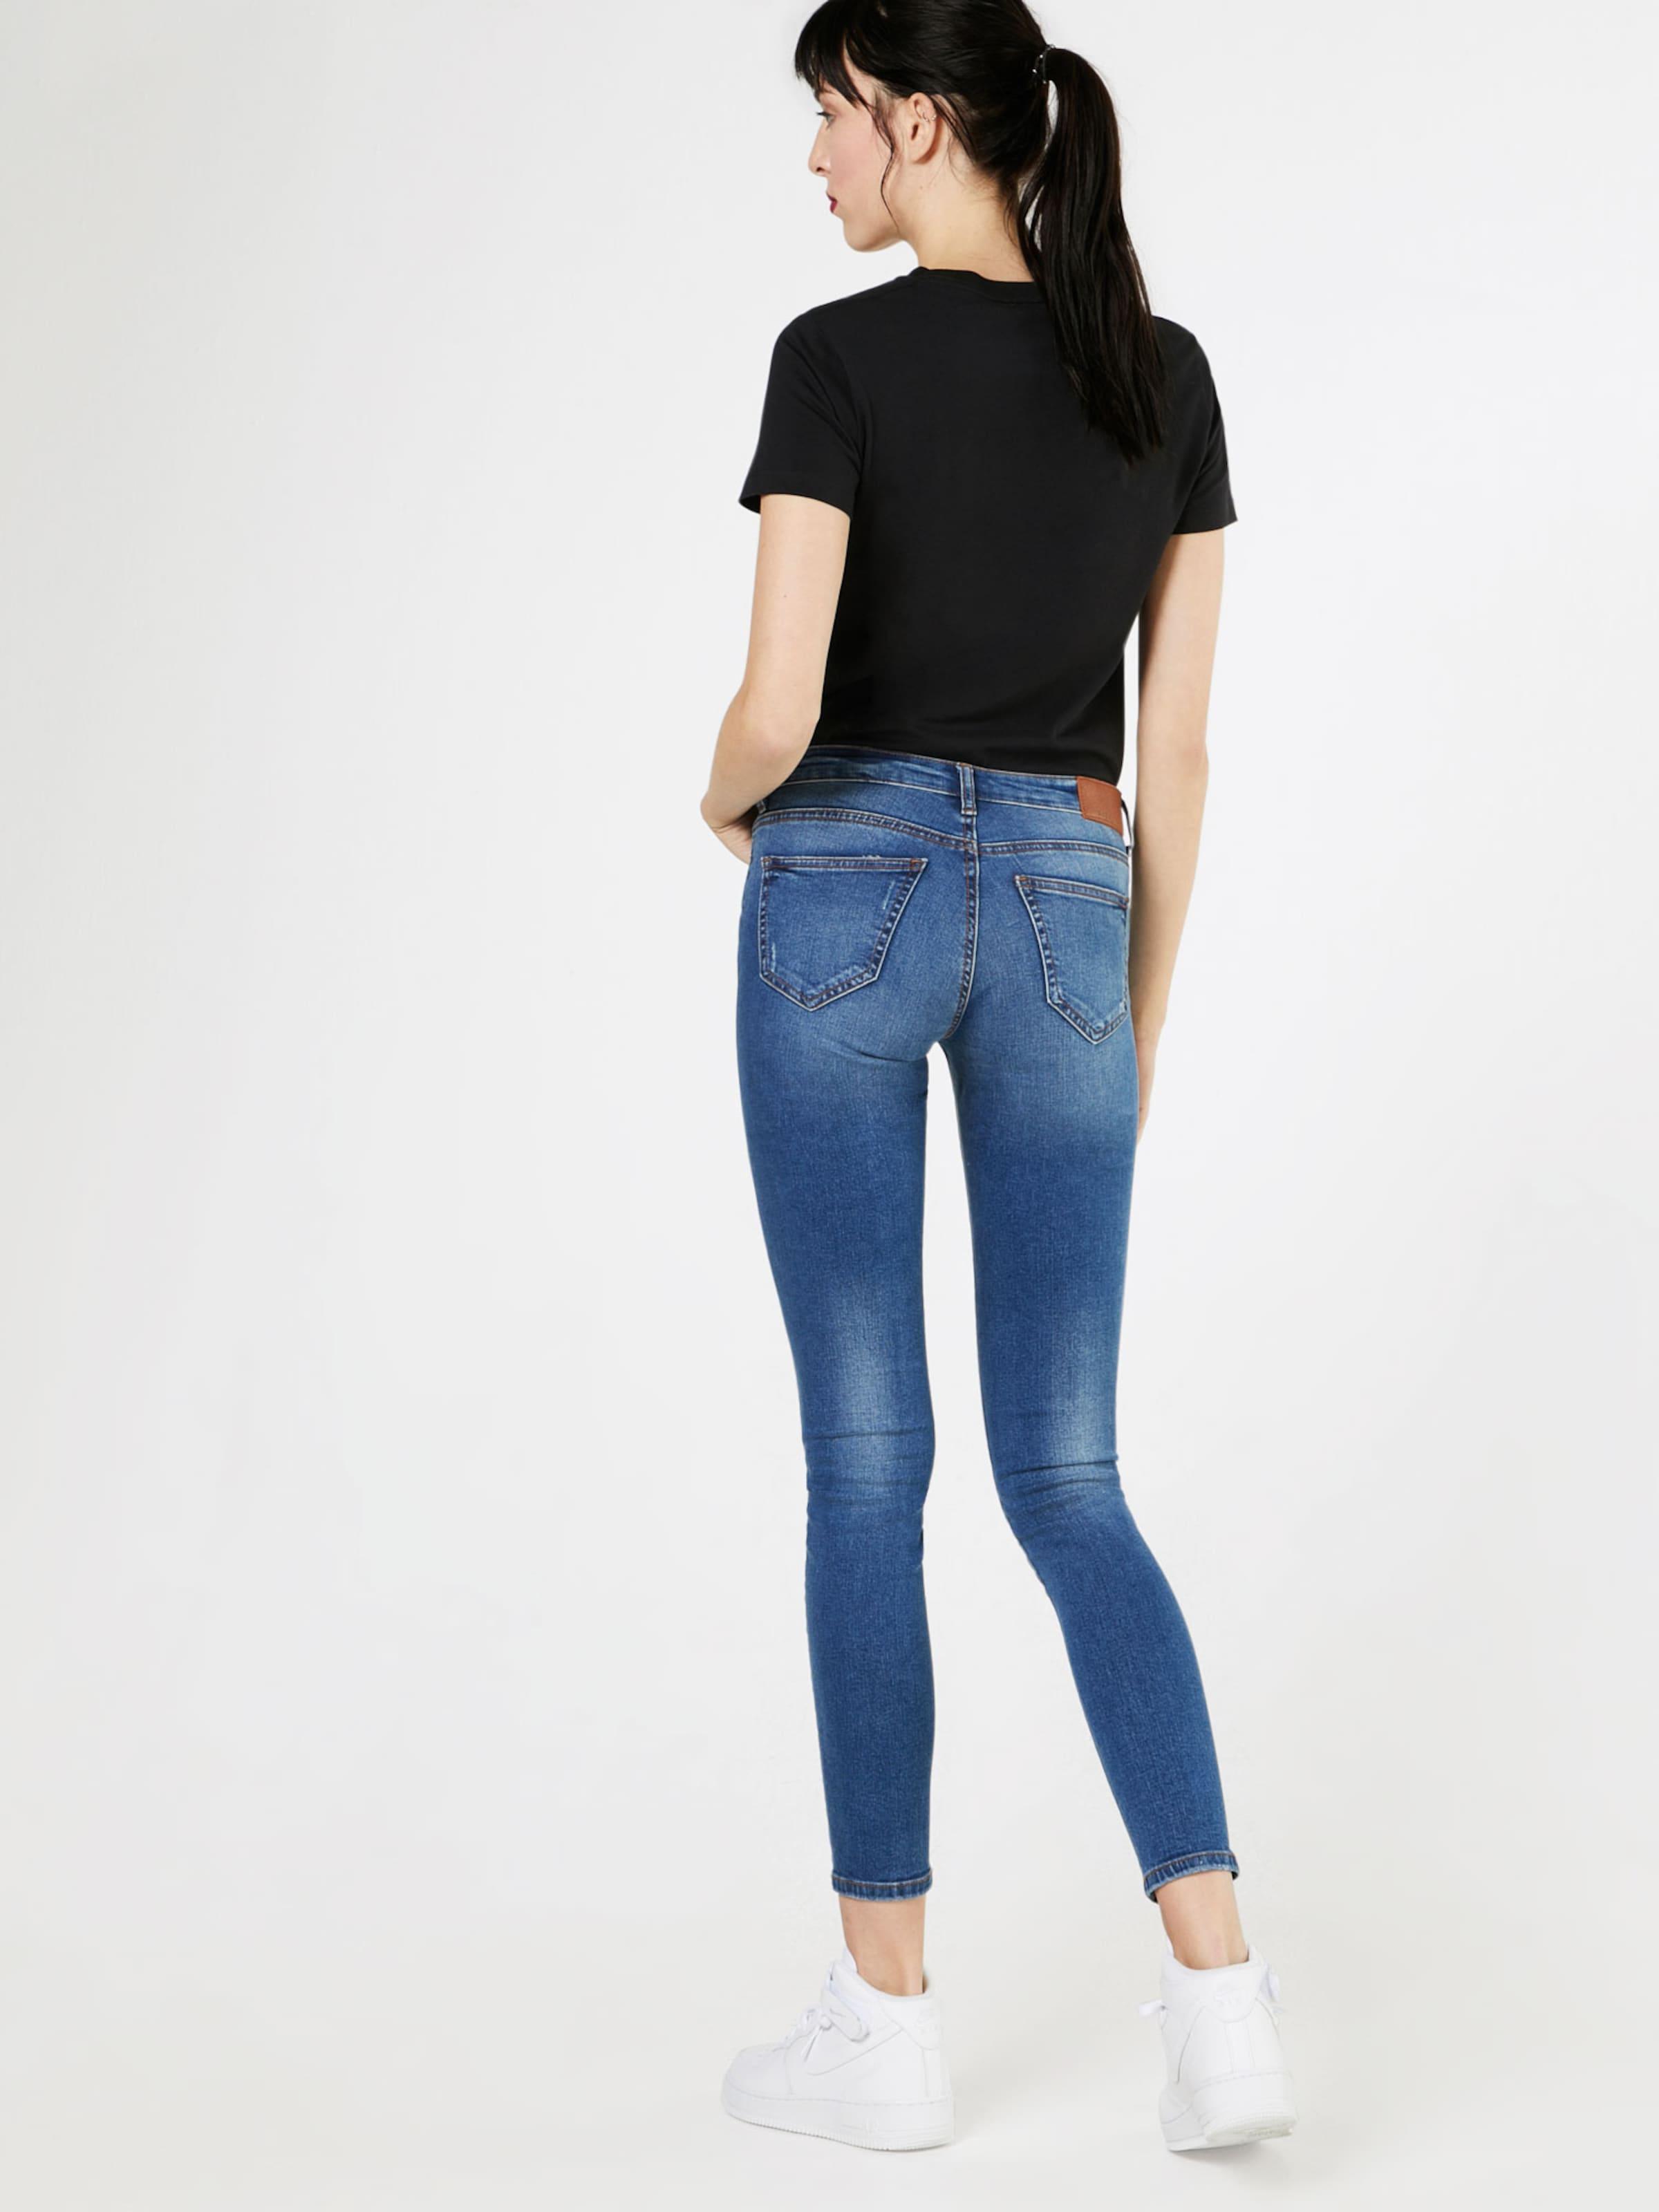 'nmeve' In Jeans May Blue Denim Noisy Skinny QChsrtd